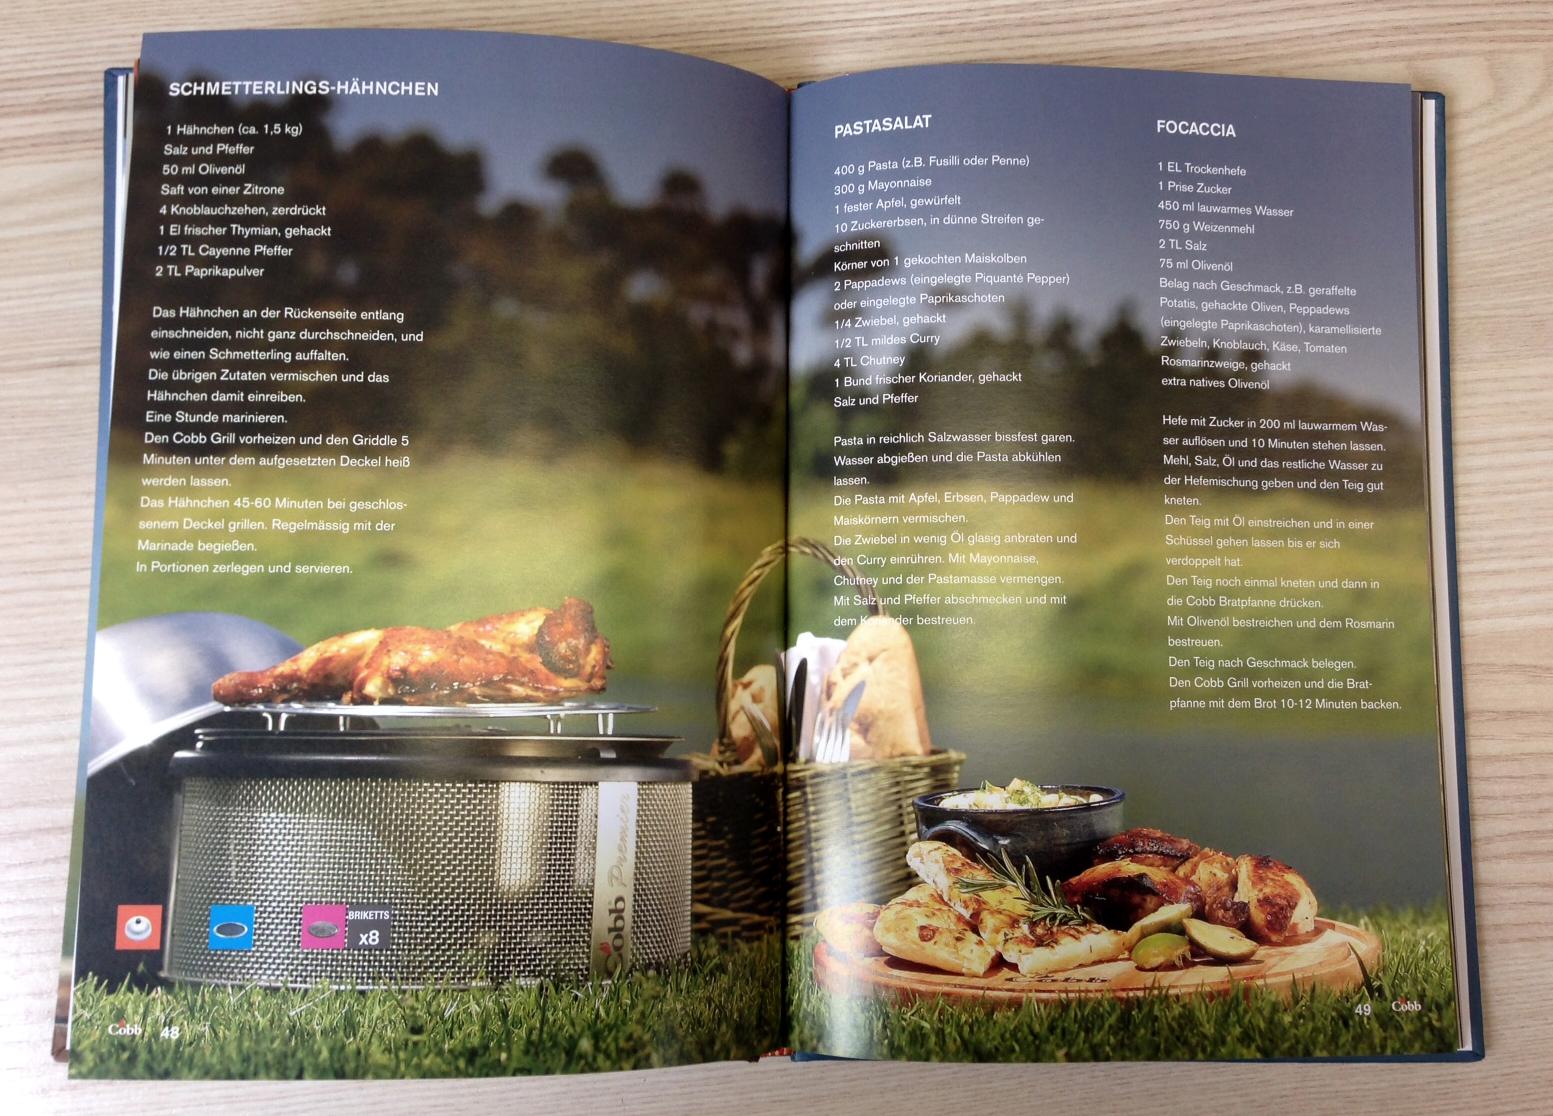 cobb grill barbecuebuch. Black Bedroom Furniture Sets. Home Design Ideas